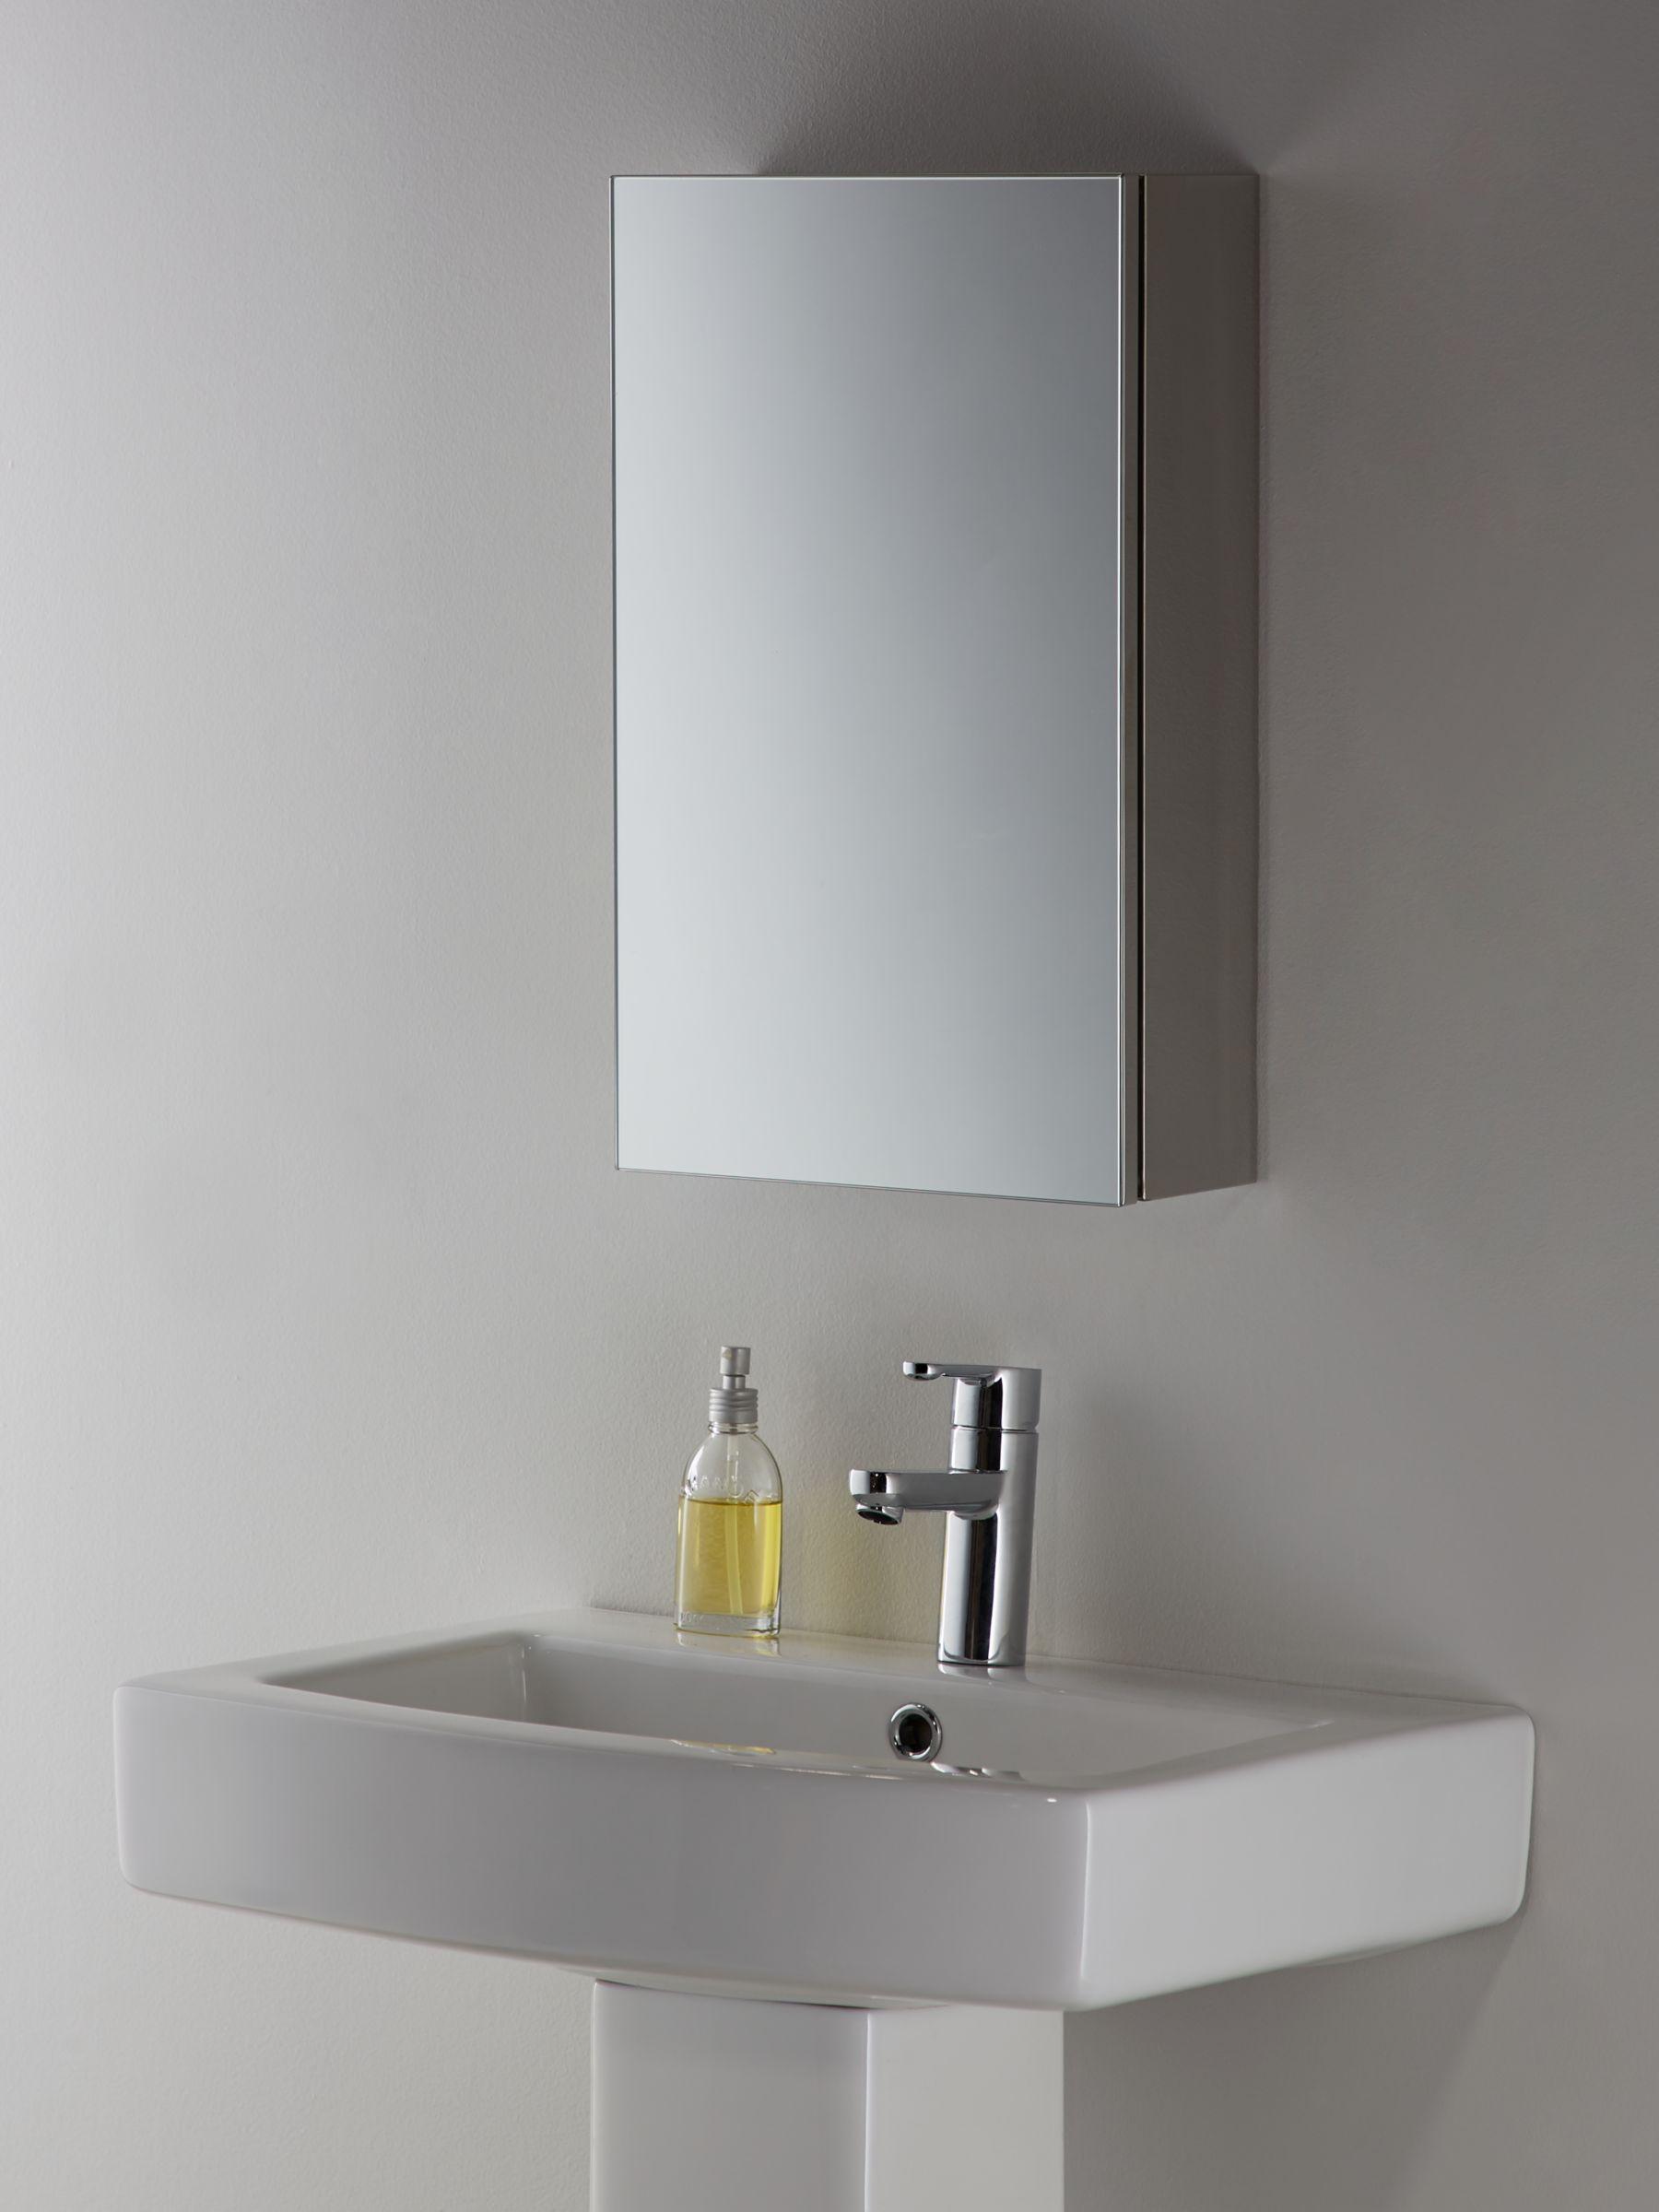 John lewis small single mirrored bathroom cabinet for Bathroom cabinets john lewis uk